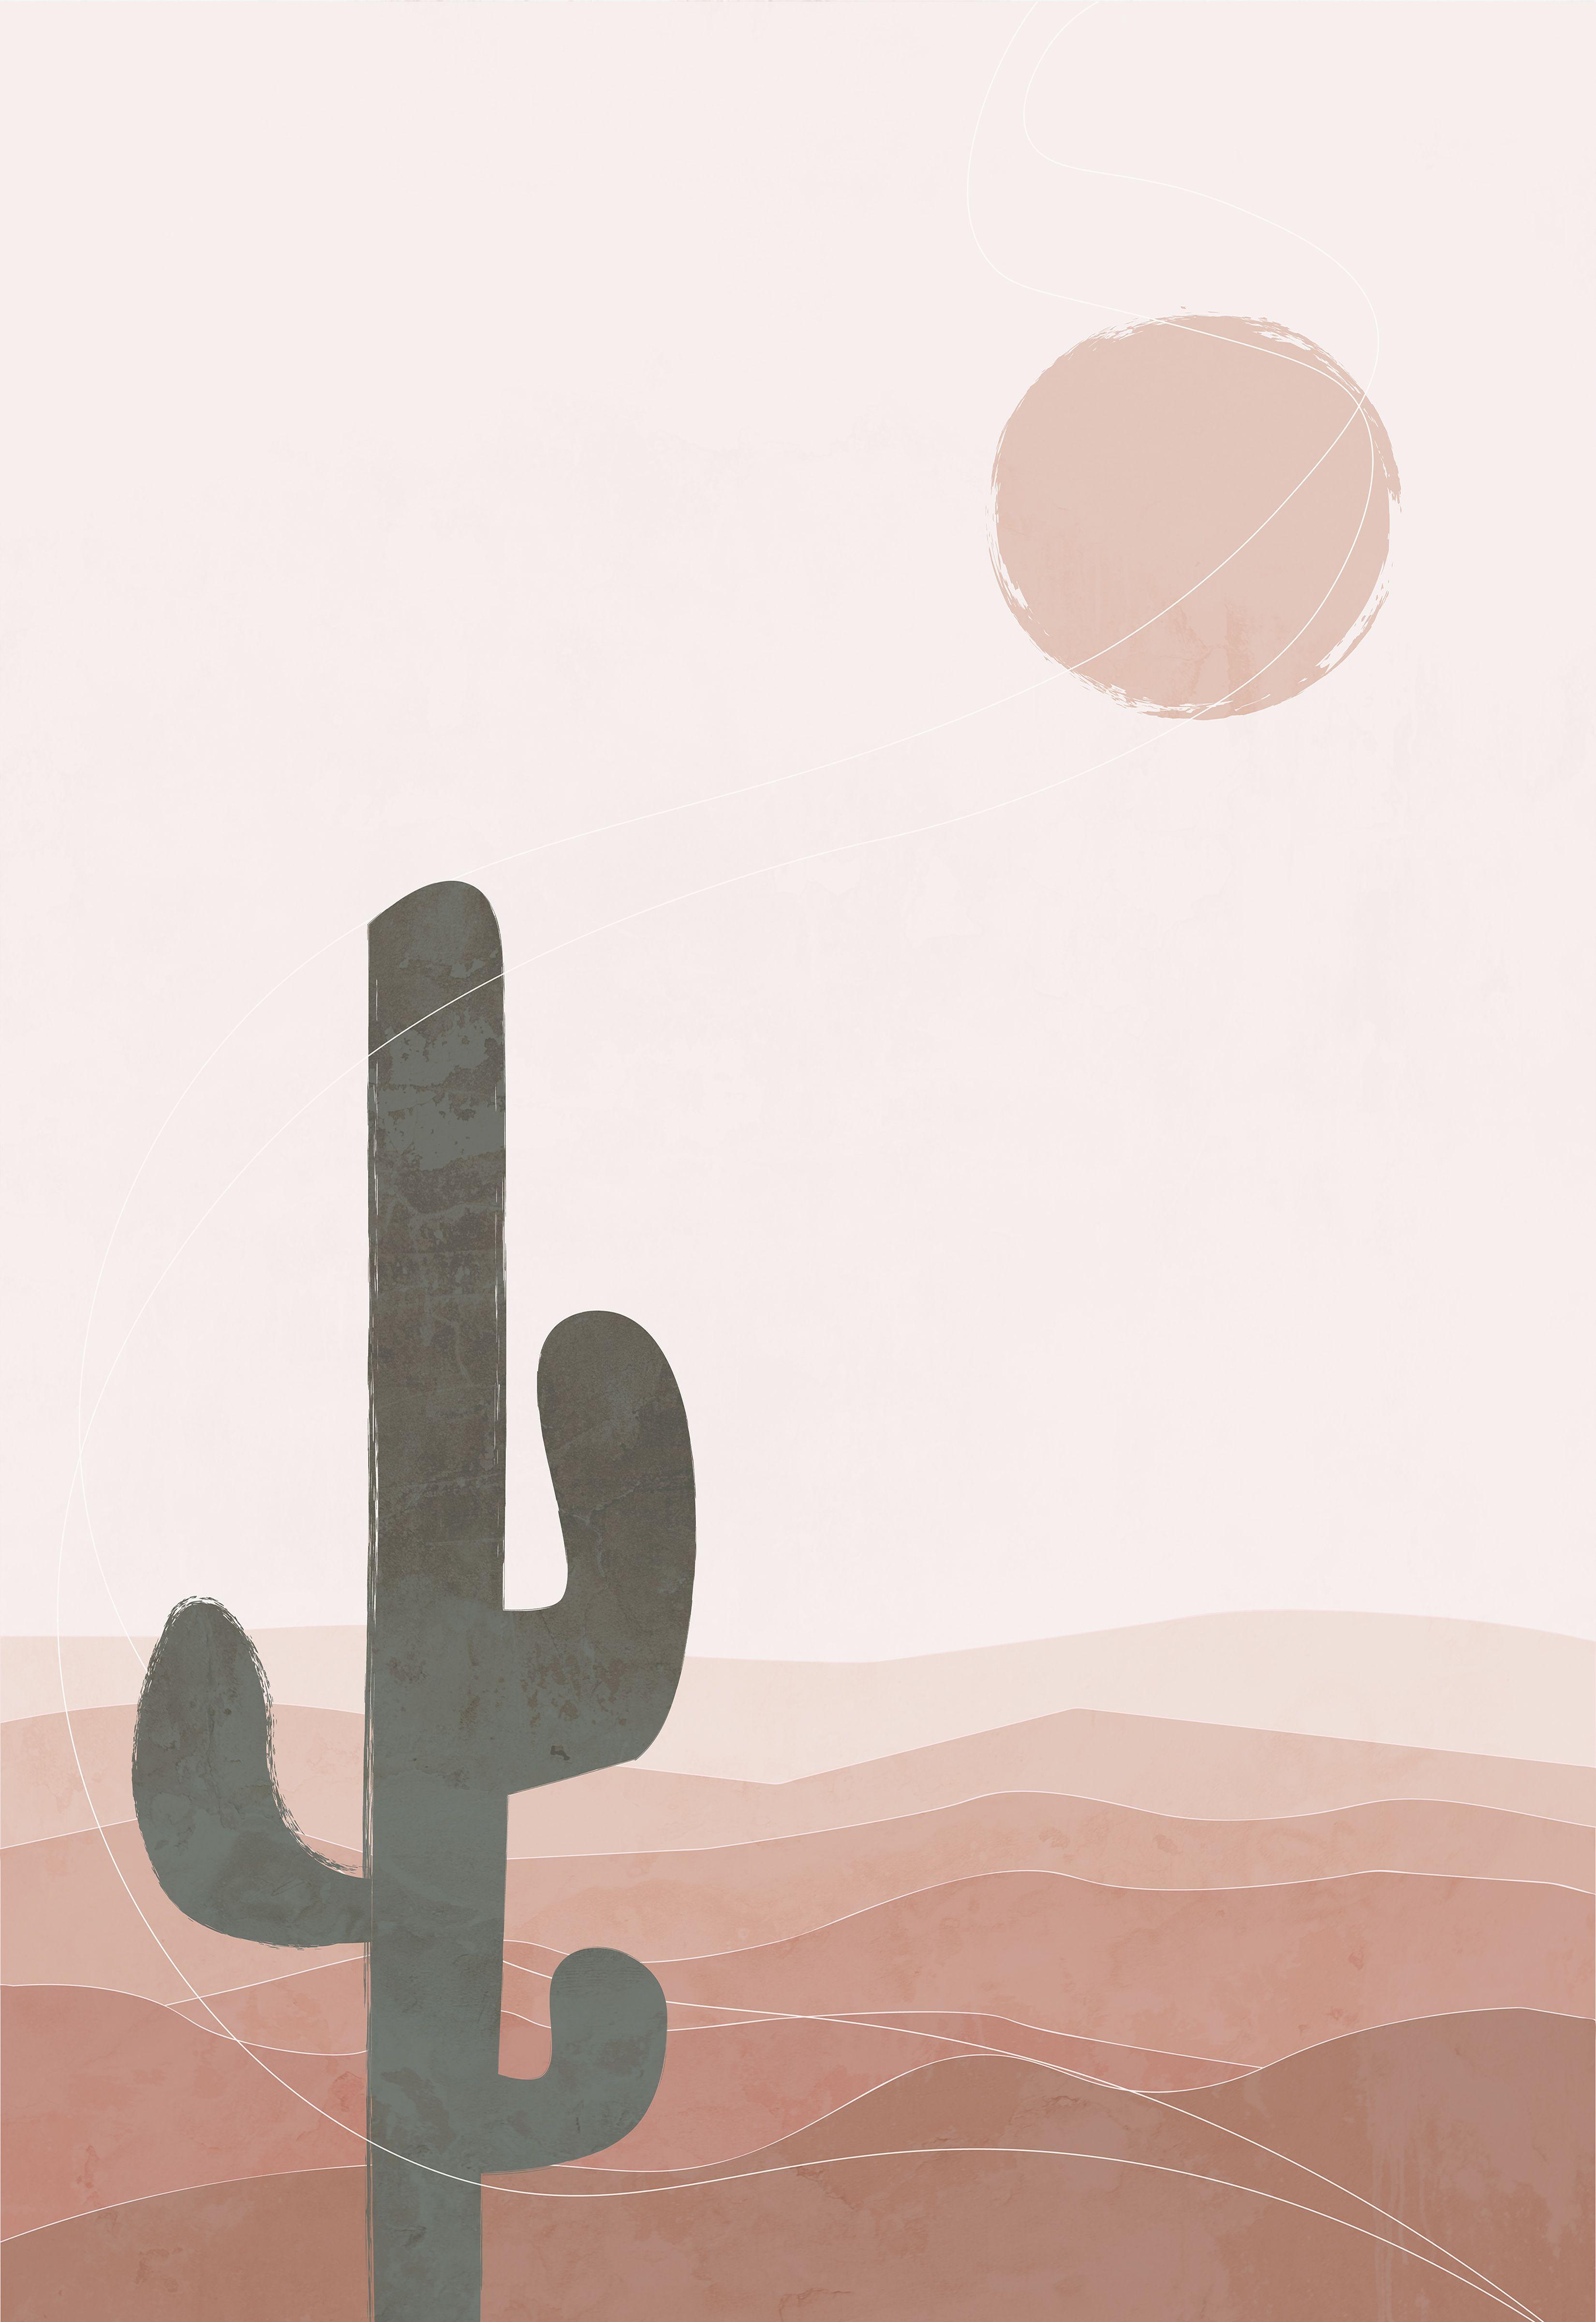 Abstract Landscape Desert Art Print Mid Century Art Mountain Wall Art Southwestern Decor Cactus Print Bohemian Print Printable Wall Art Boho Wallpaper Wall Printables